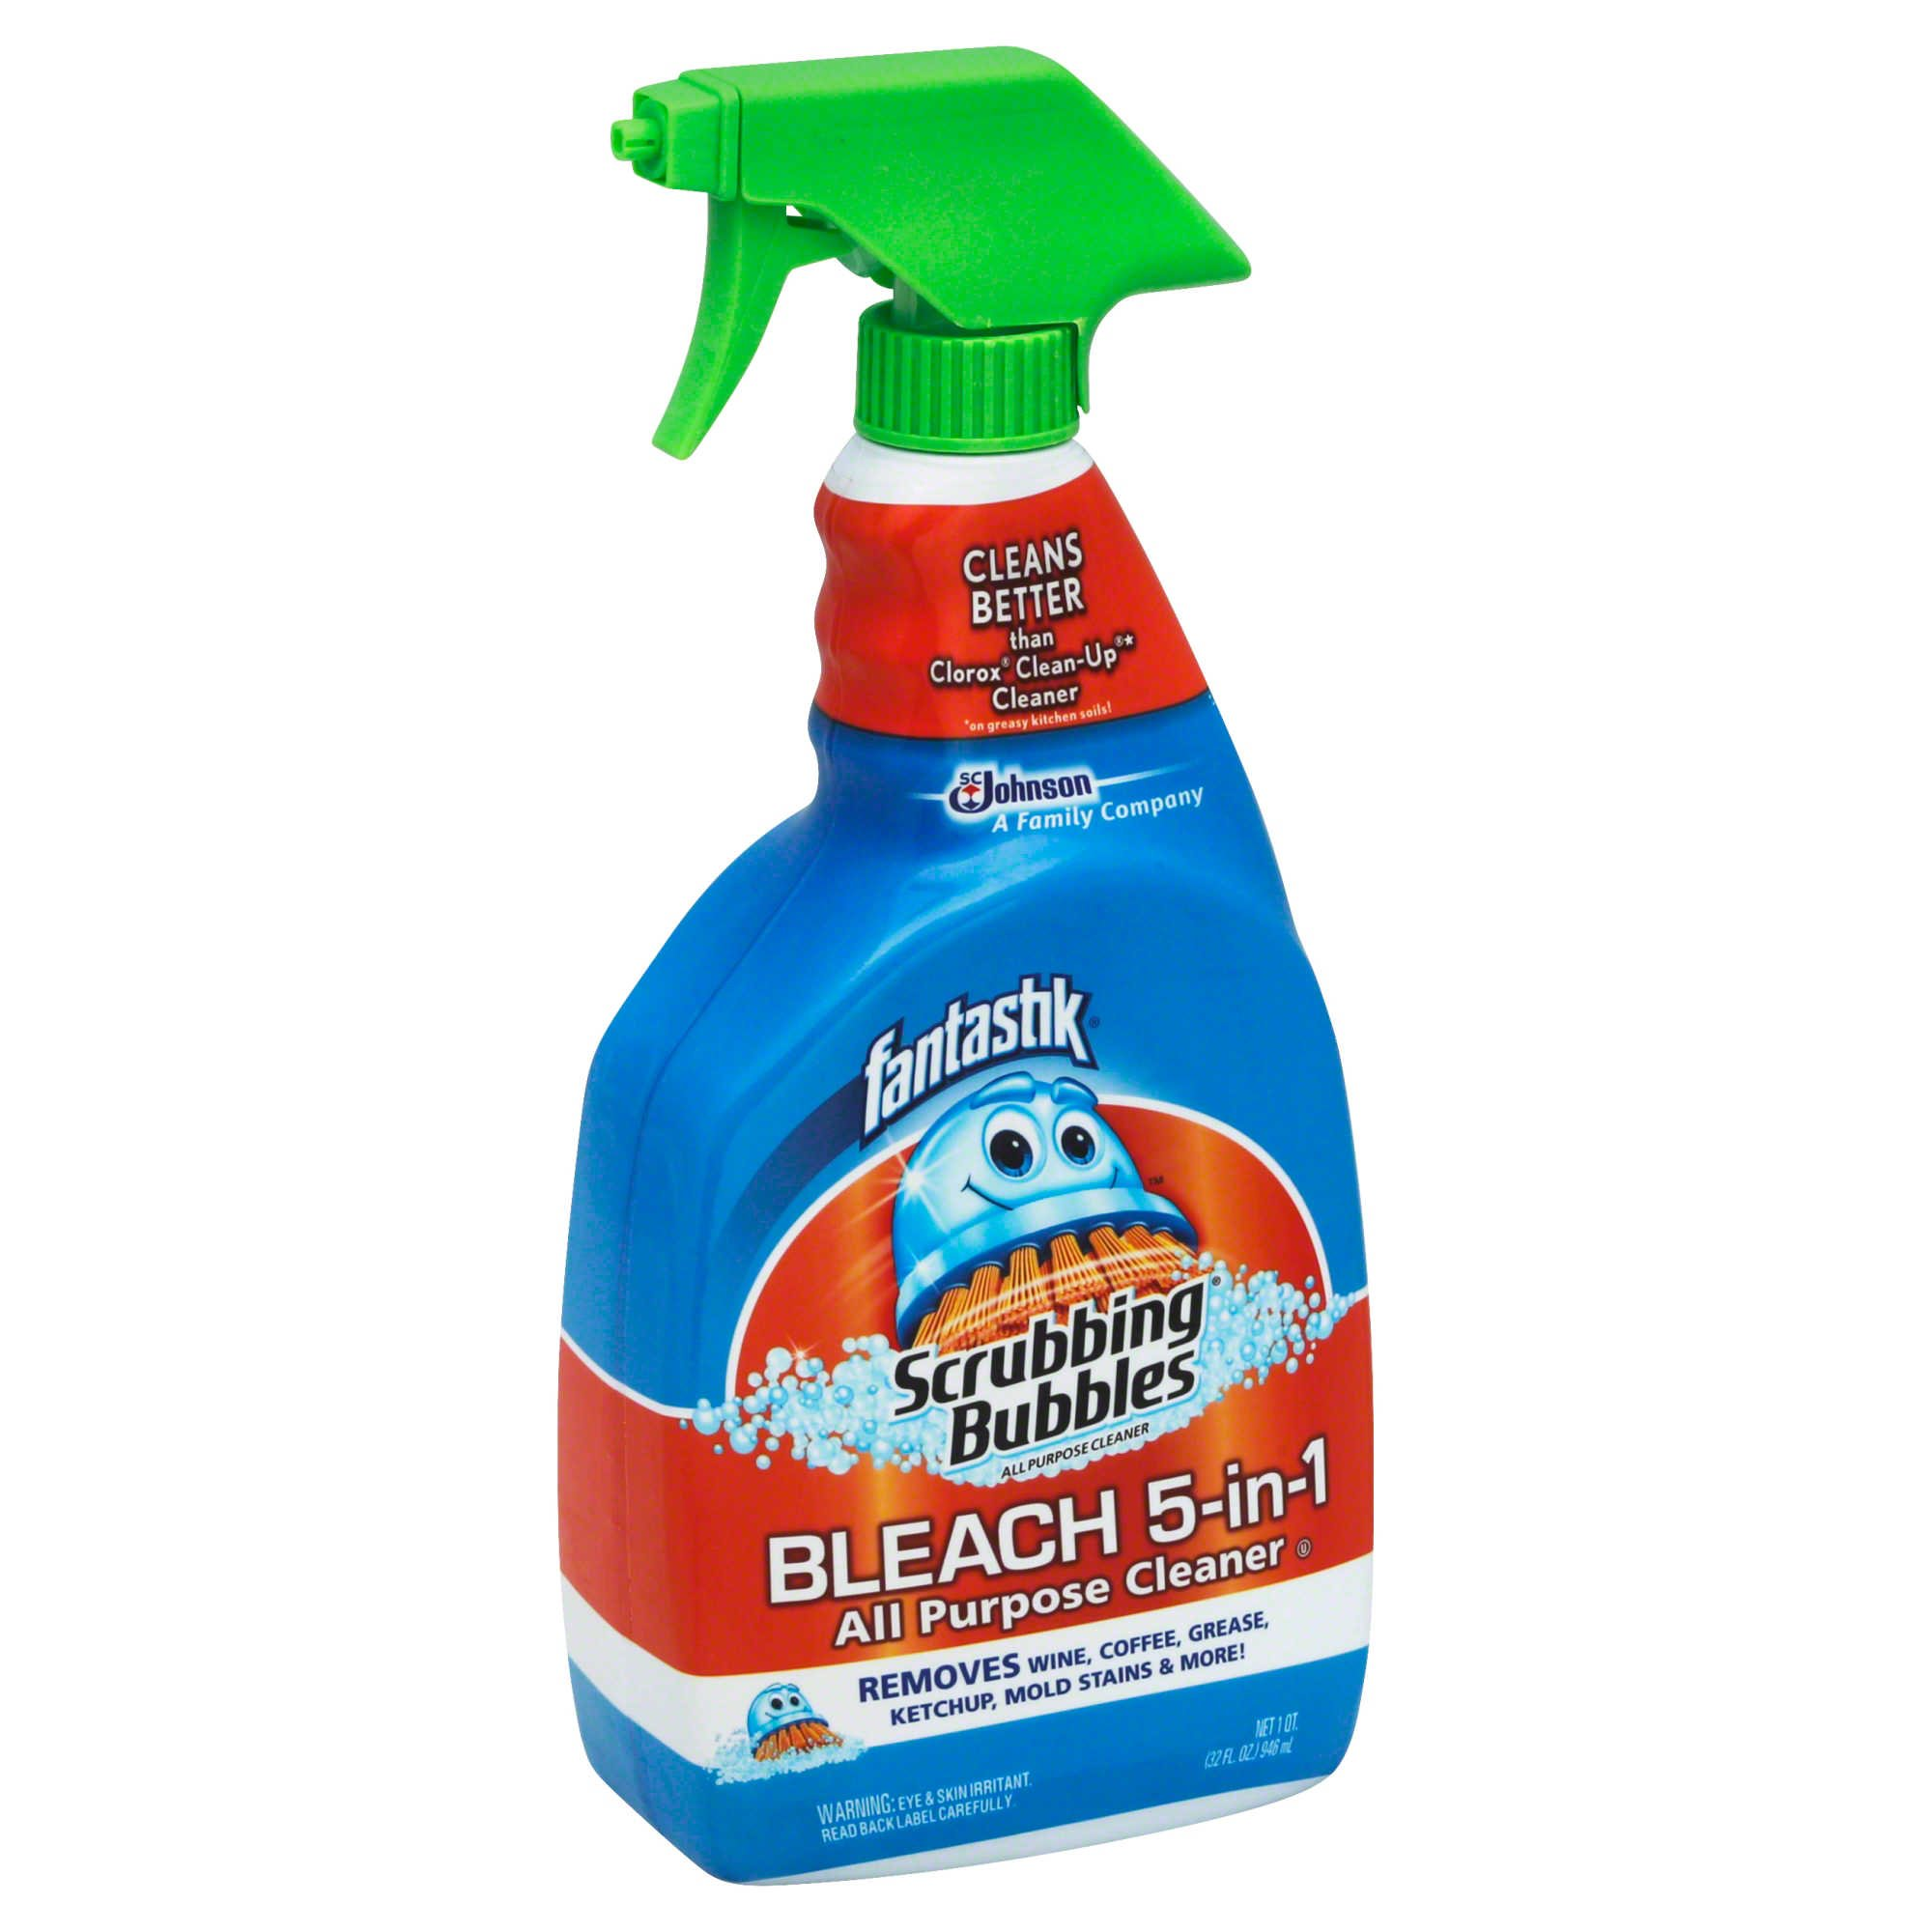 Fantastik 32 oz. Scrubbing Bubbles Bleach 5-in-1 Cleaner